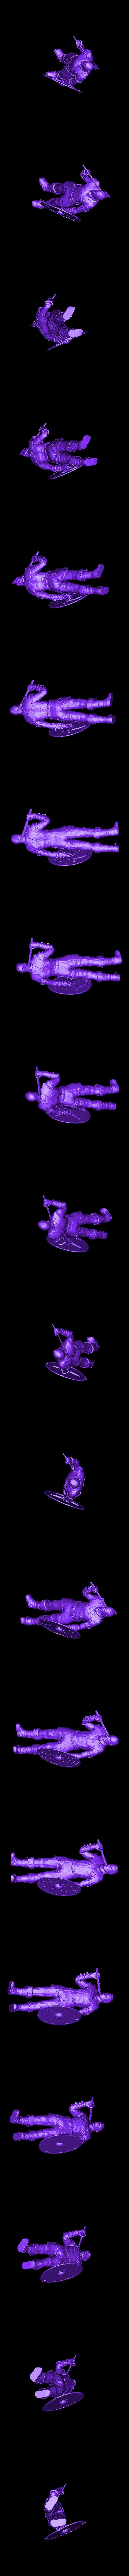 VIKING.stl Download free STL file VIKING • 3D printer object, Boris3dStudio